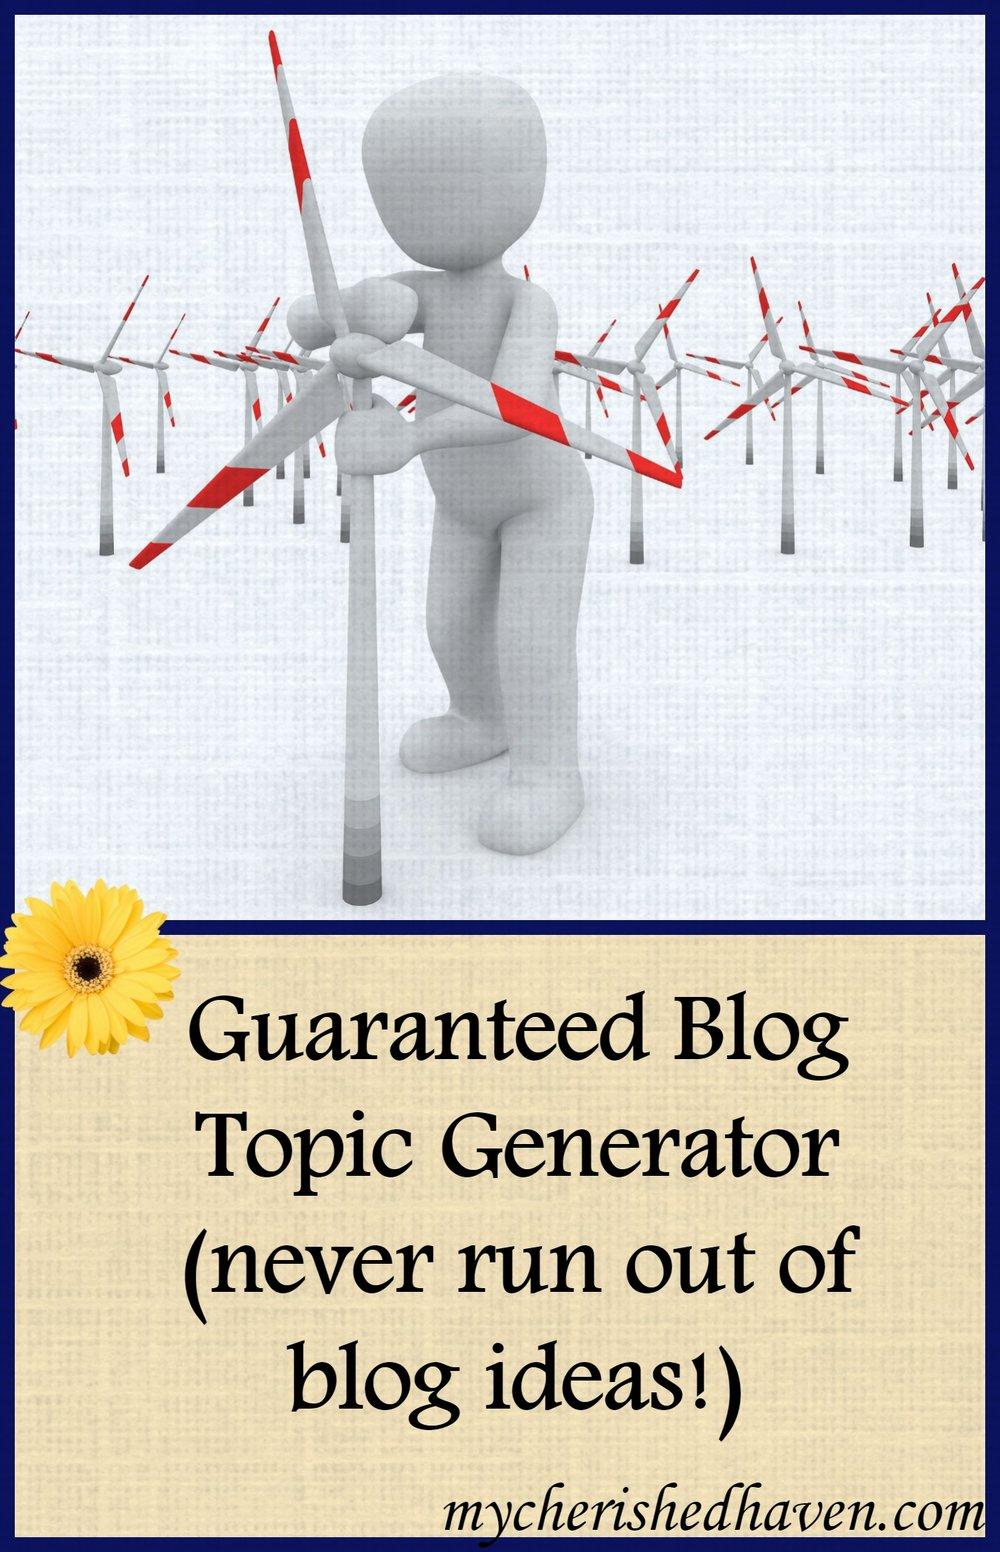 blogtopicgenerator